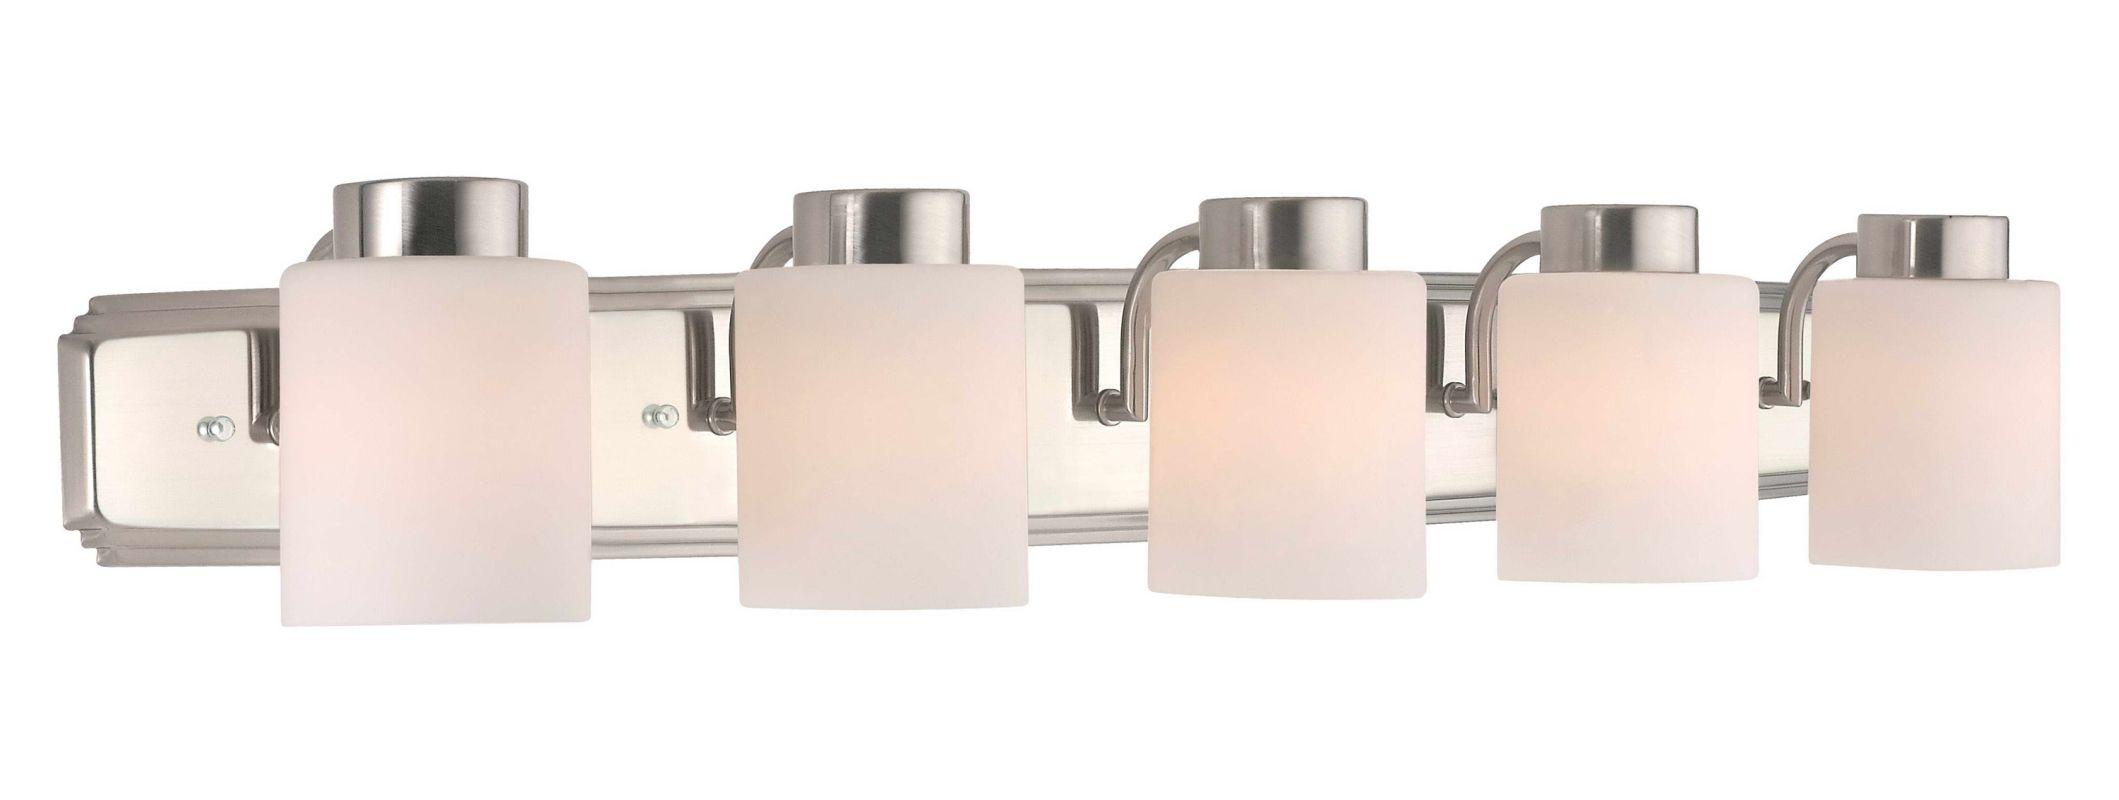 Brilliant Bathroom Vanity Lights Pictures Bathroom Vanity Lights Amazon Bathroom